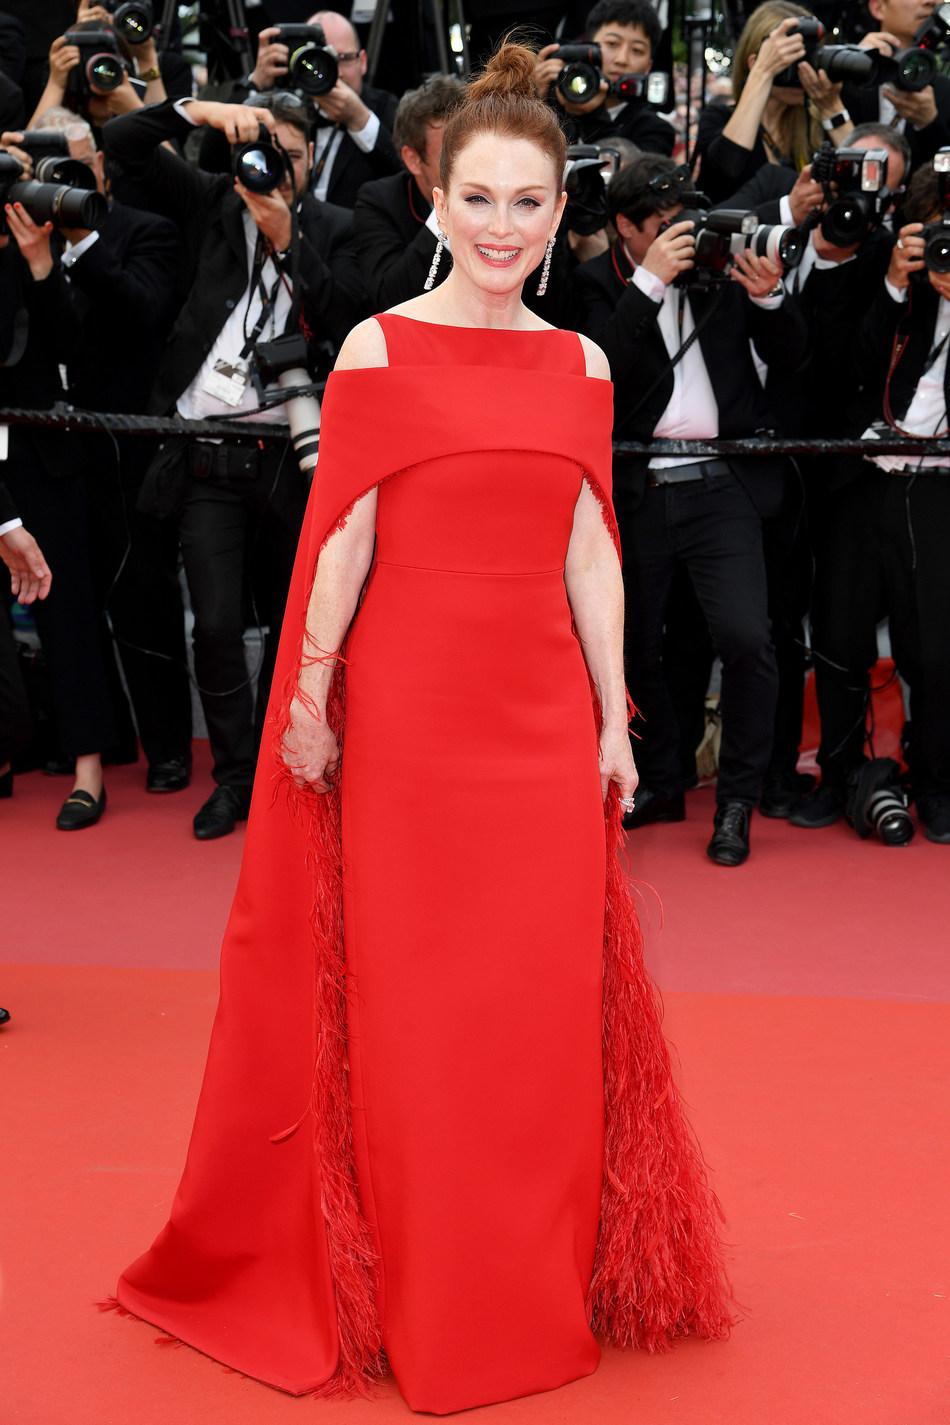 Julianne Moore Wears Platinum Jewelry at Cannes #BePlatinum